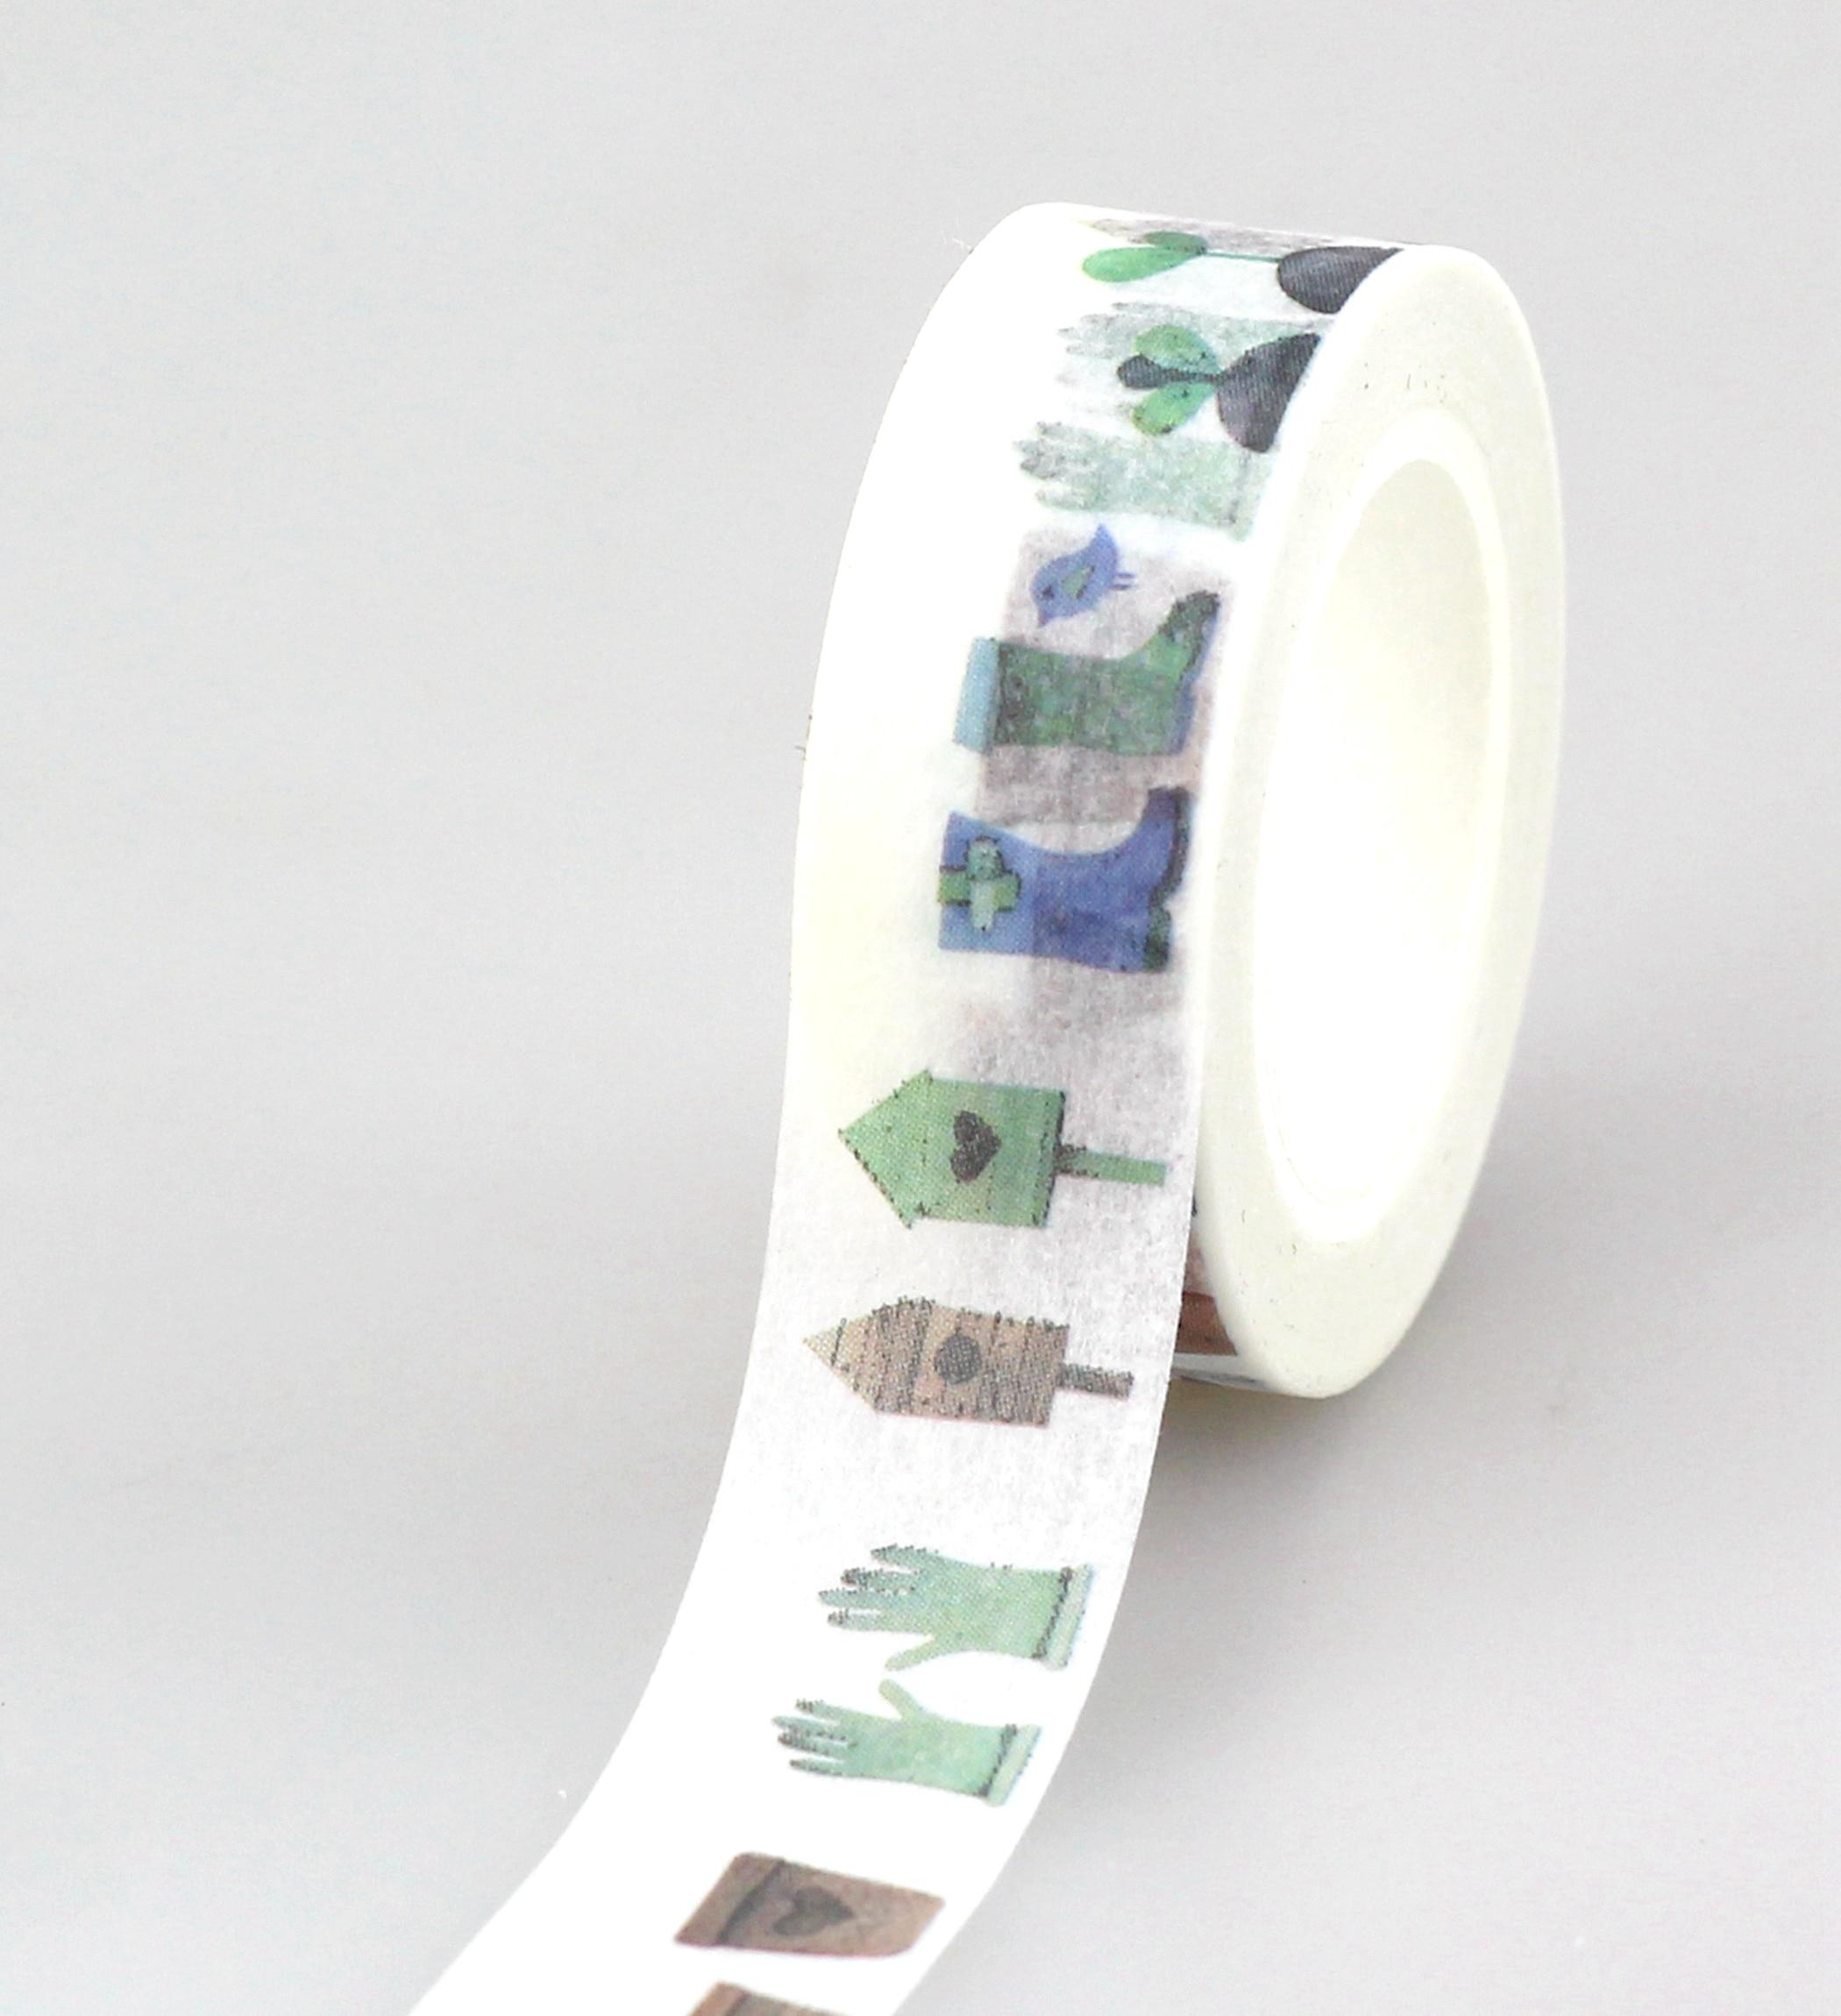 10pcs/lot Decorative Cute Birdhouses Washi Tapes Paper DIY Scrapbooking Planner Adhesive Masking Tapes Kawaii Stationery